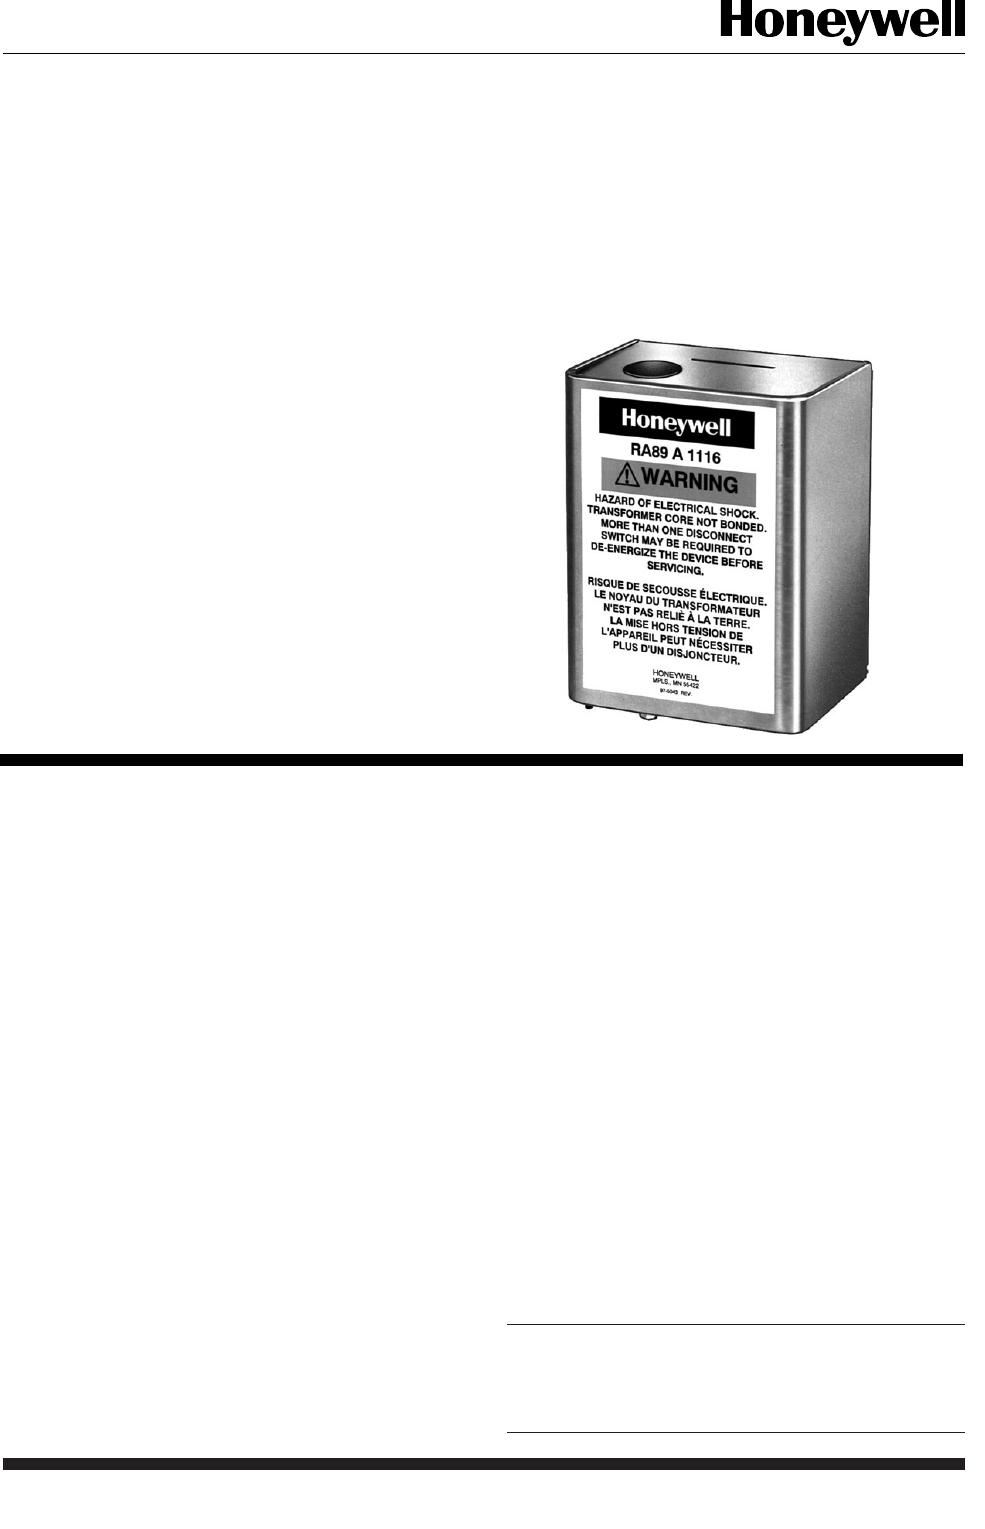 [DIAGRAM_5FD]  Honeywell Switch R182J Users Manual 60 2481 R182J, R482J, R845A, R847A,  R882J, RA89A, RA823A Switching Relays | 240v Wiring Diagram Honeywell R847a |  | UserManual.wiki